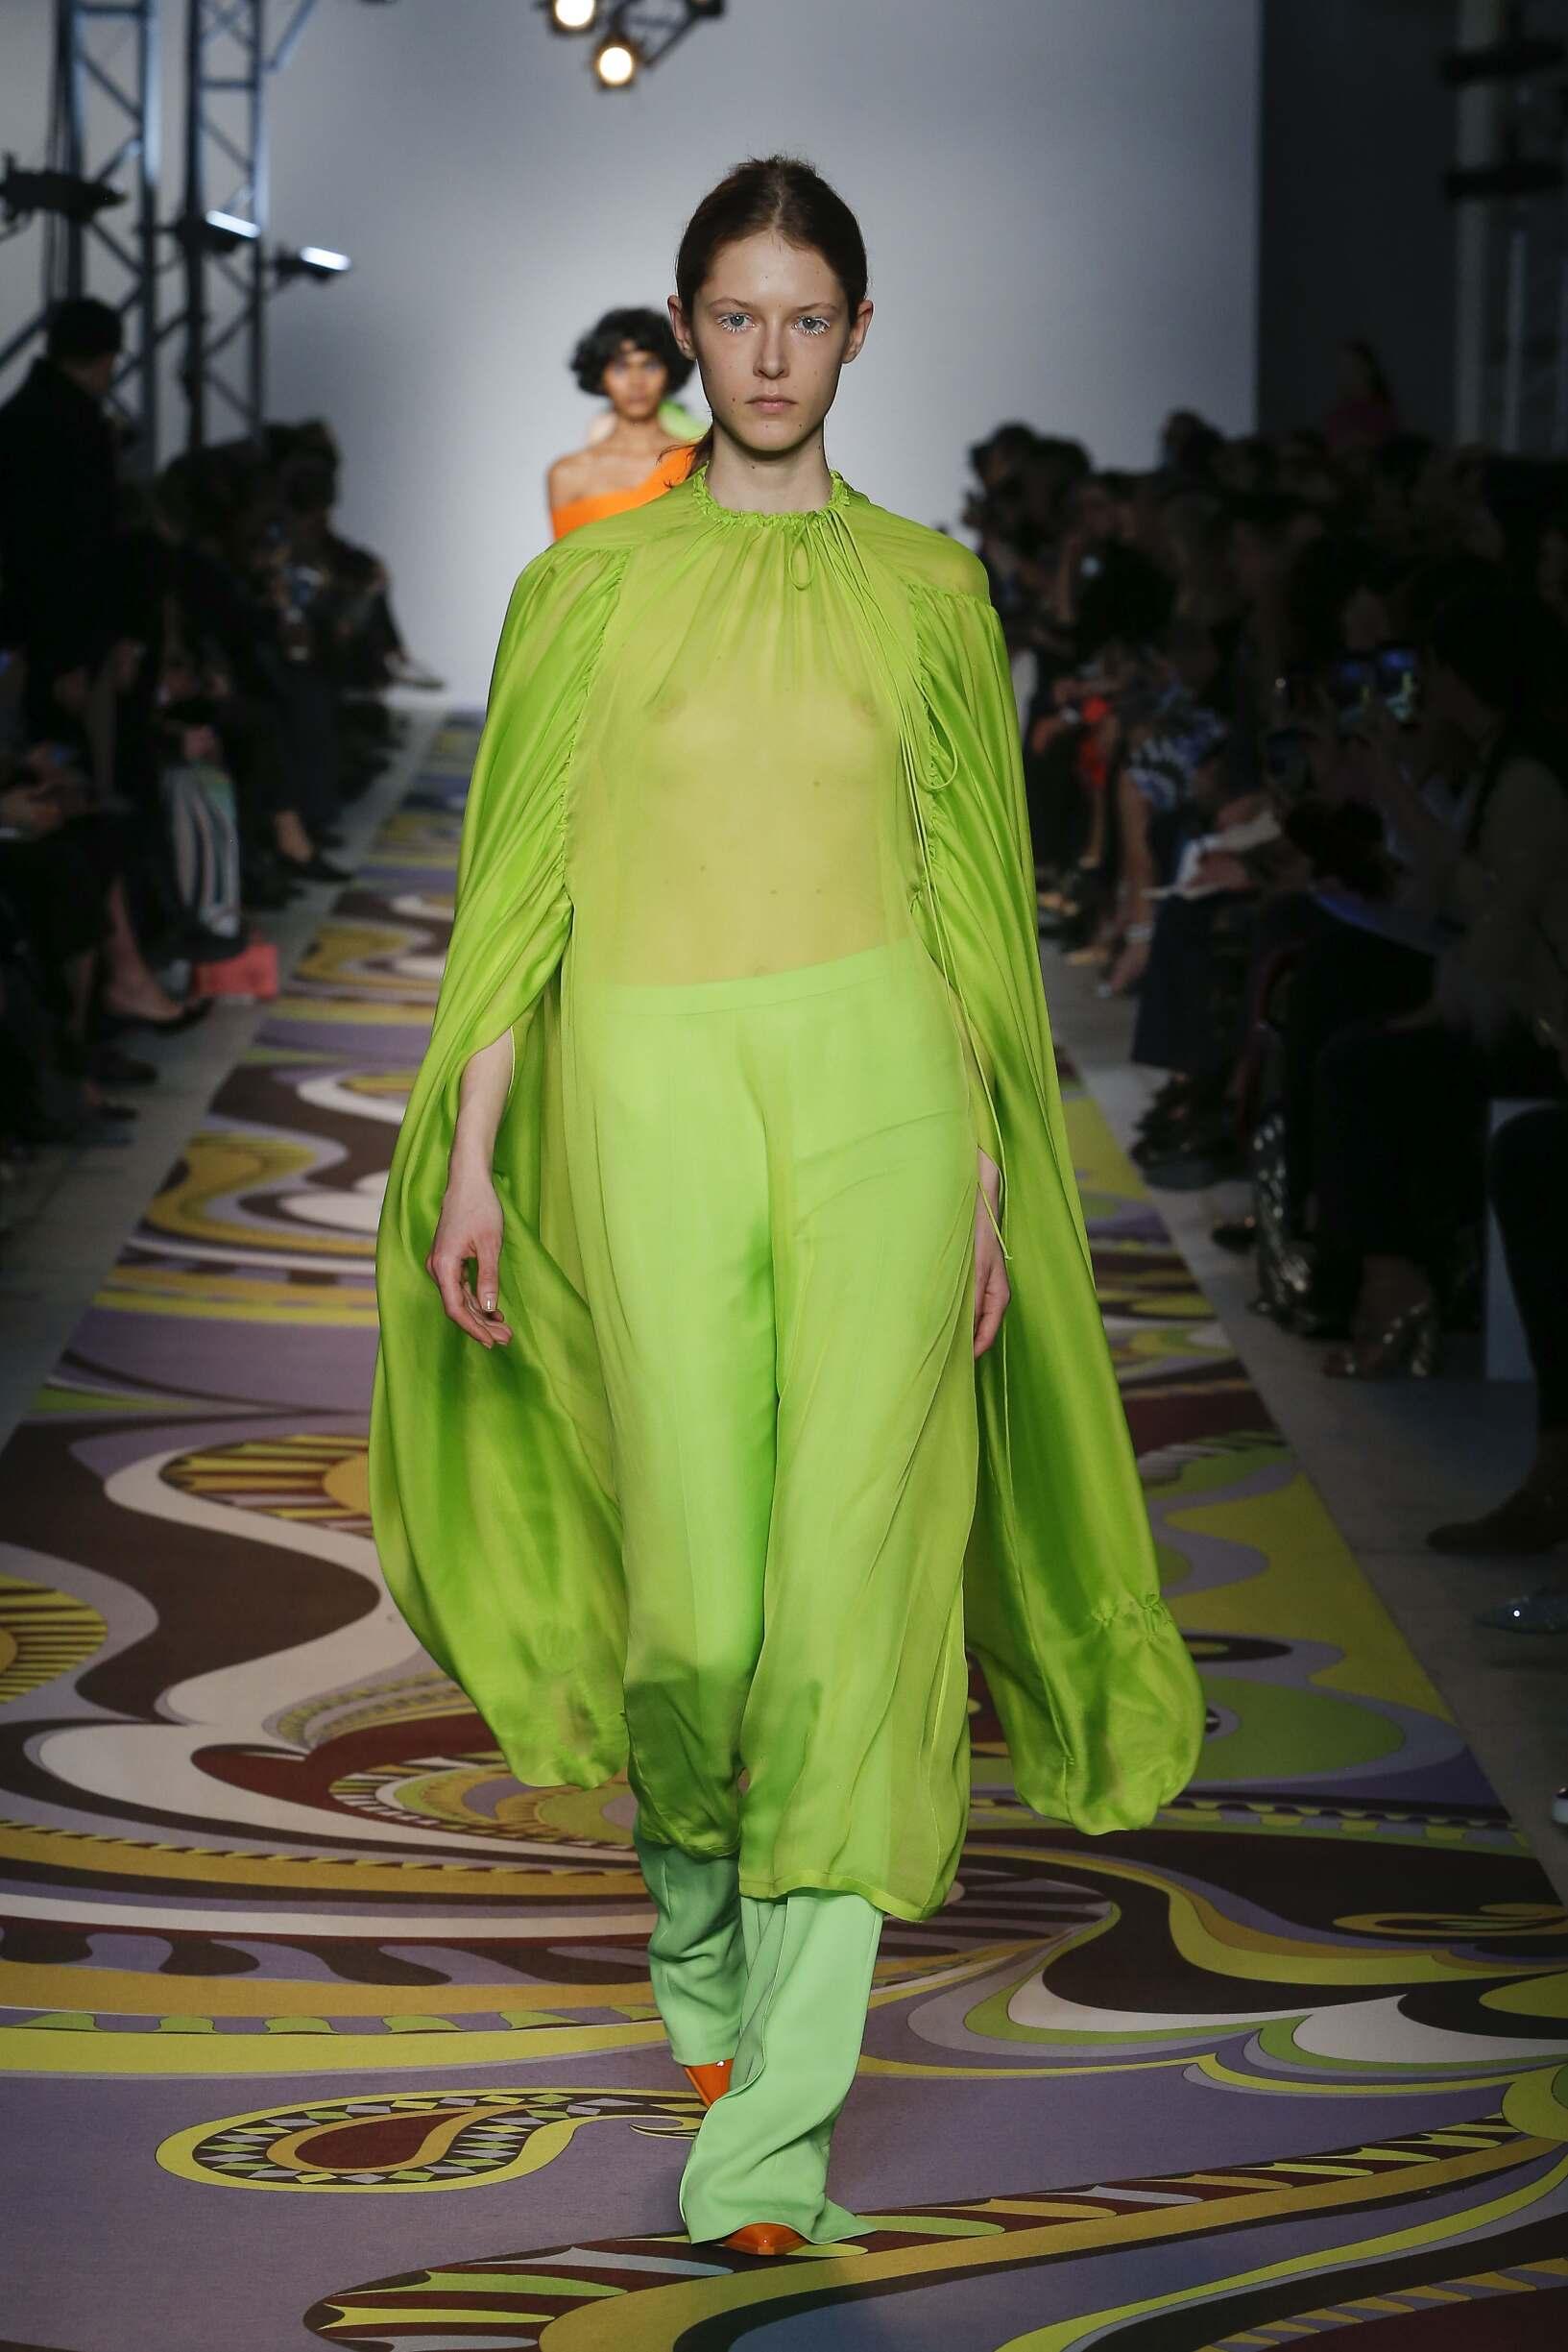 FW 2017-18 Emilio Pucci Woman Model